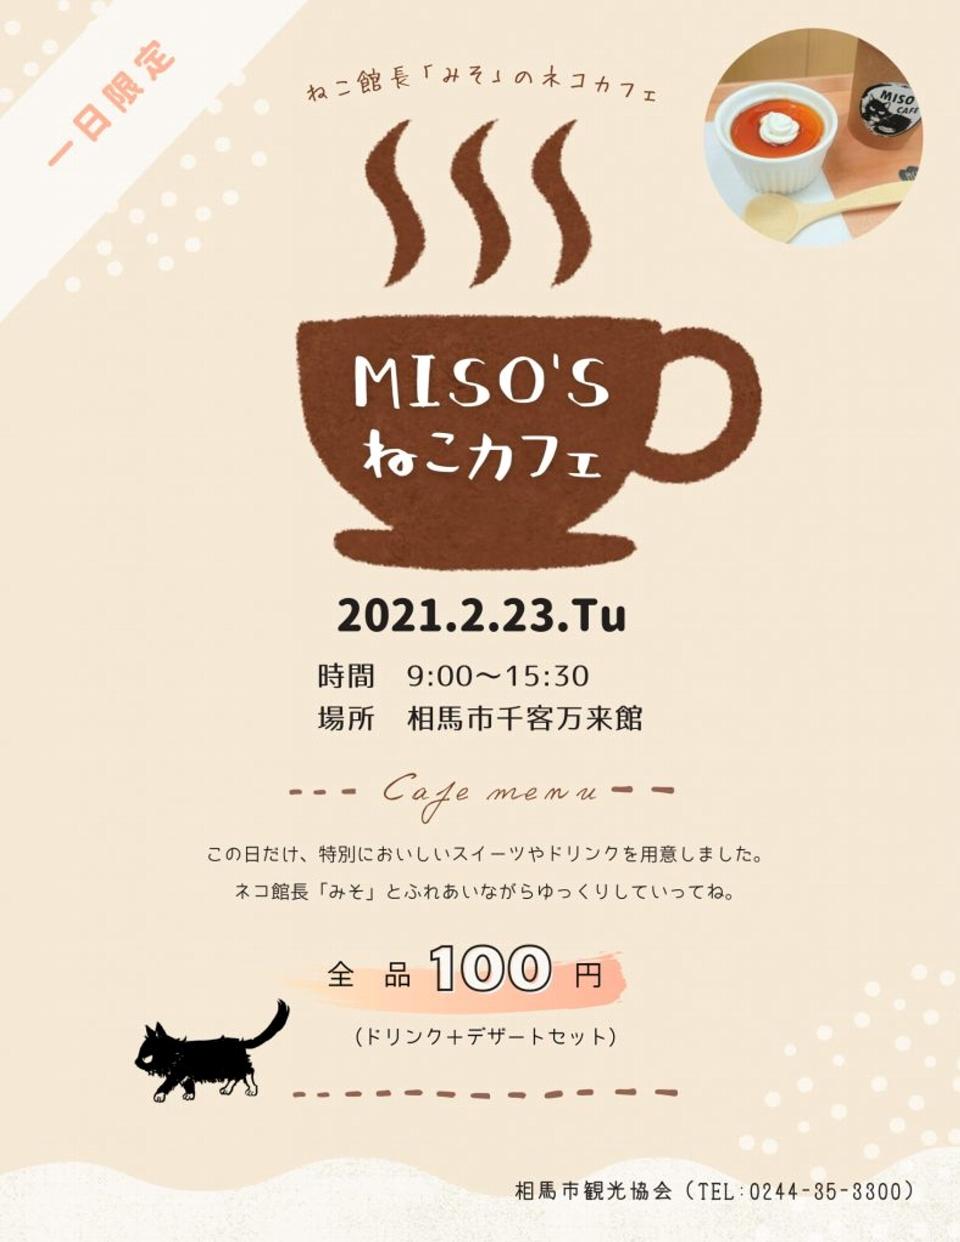 MISO'S ねこカフェ